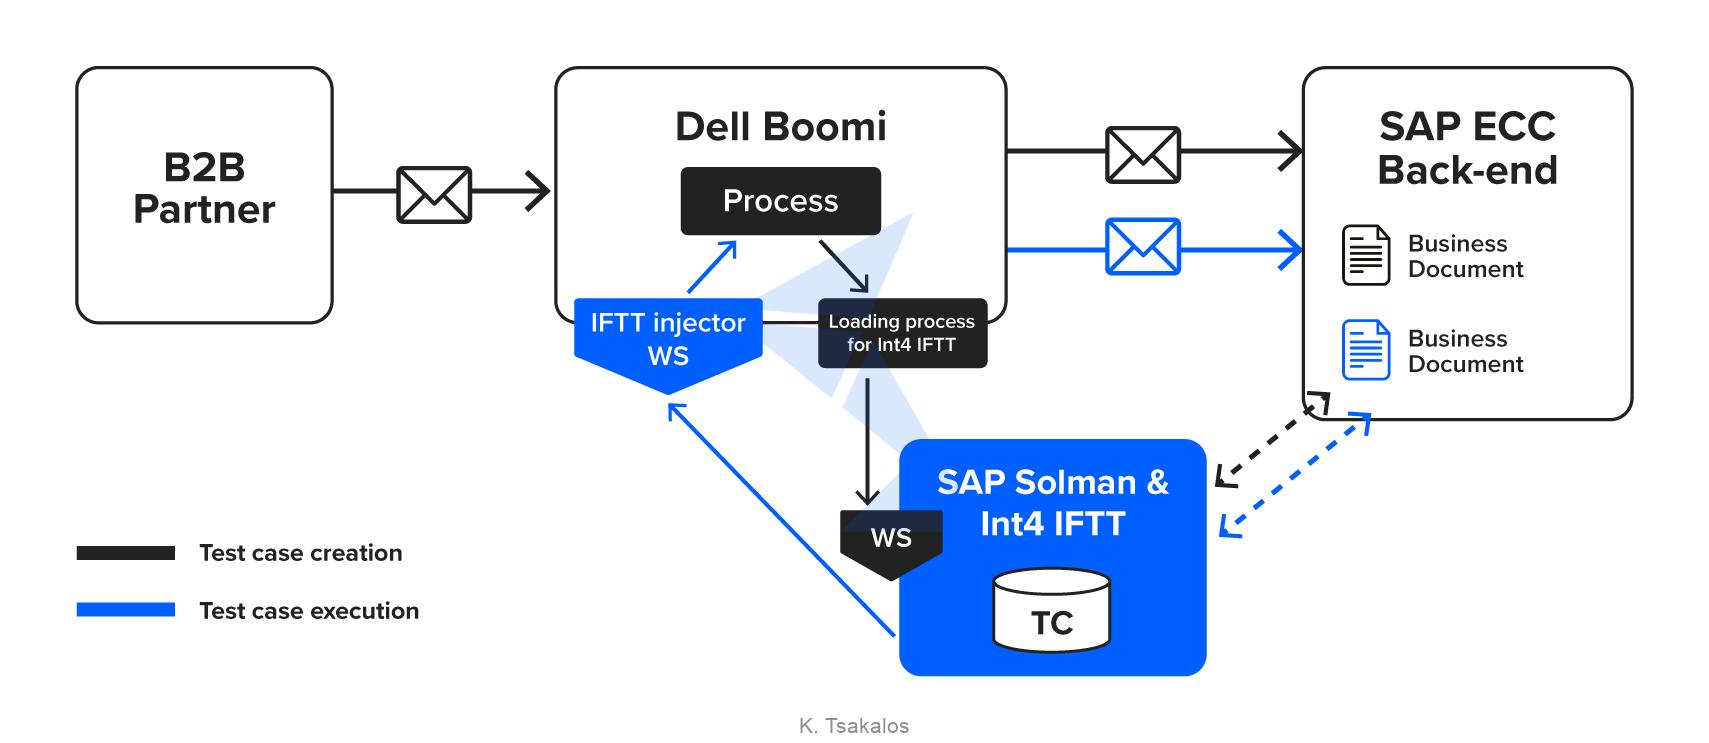 Dell_Boomi_test_integration_Int4_IFTT